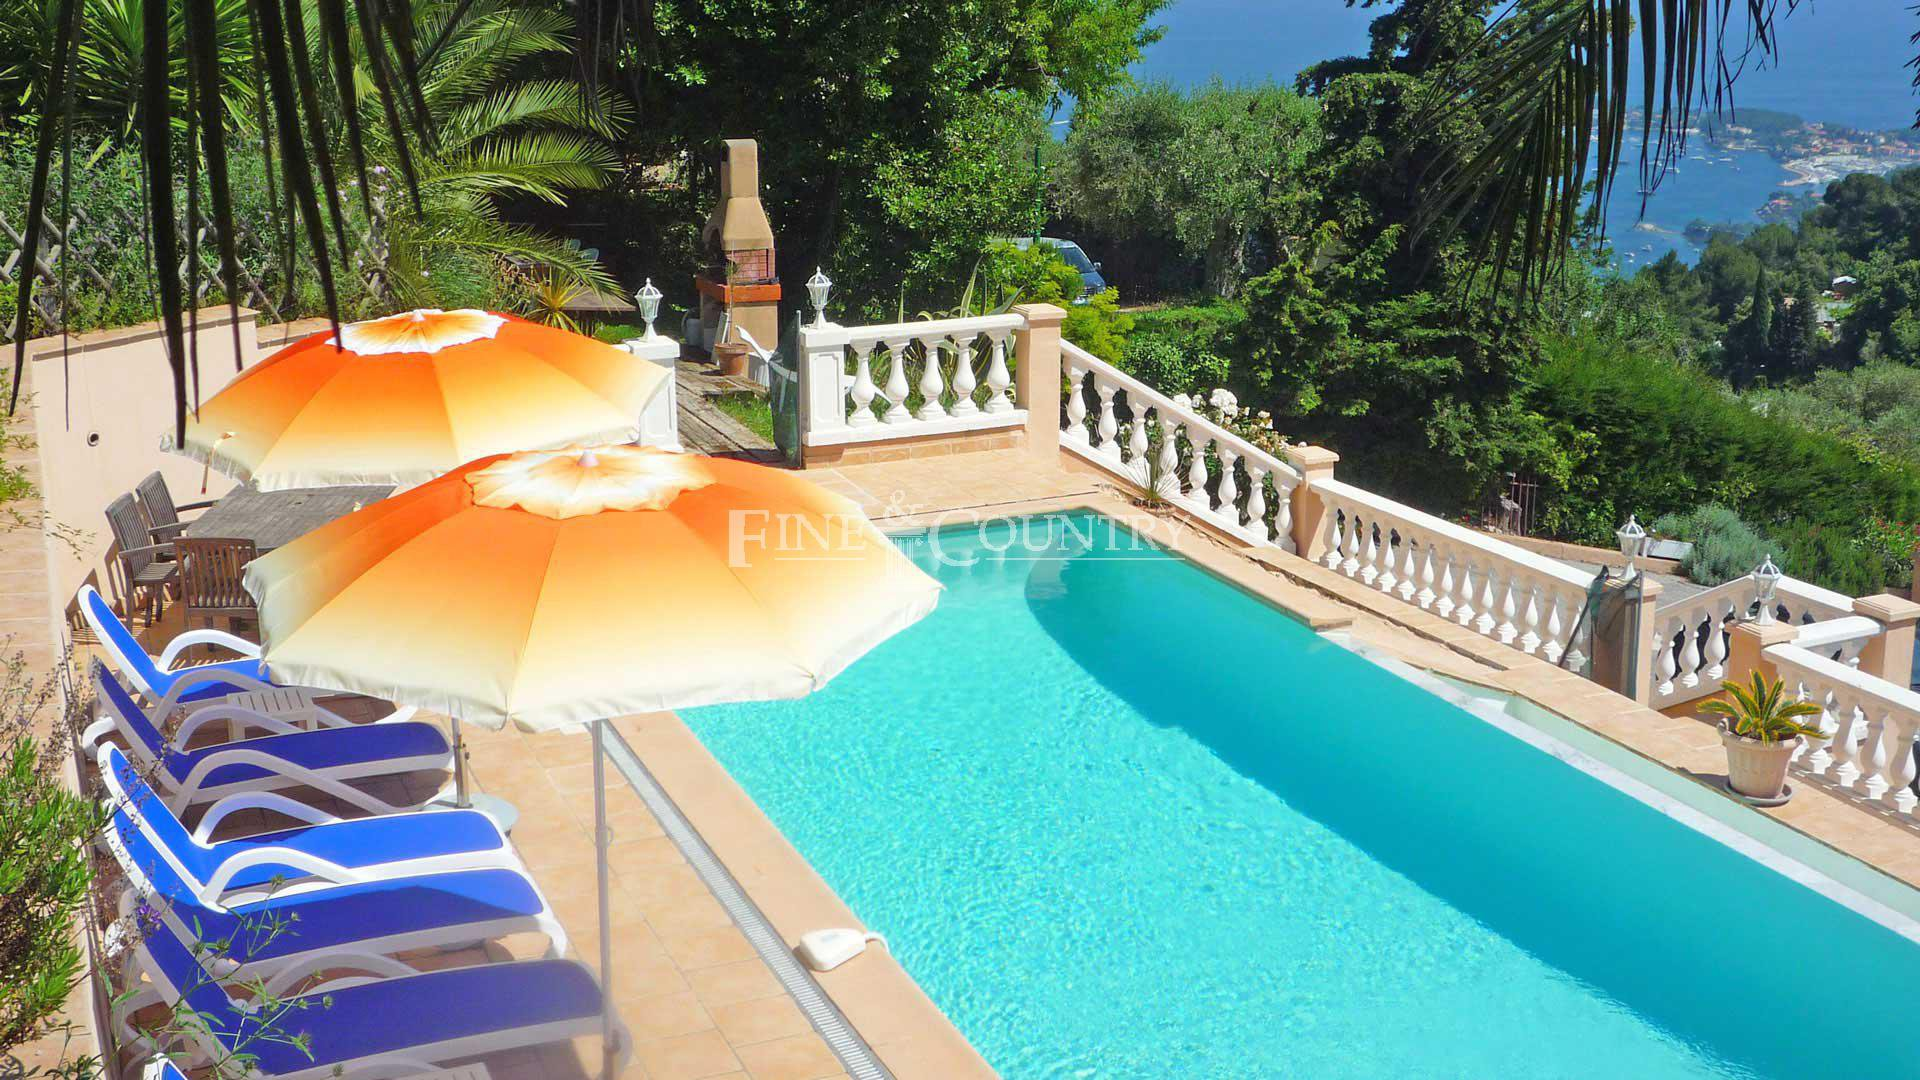 Vente Villa Villefranche-sur-mer avec vue mer